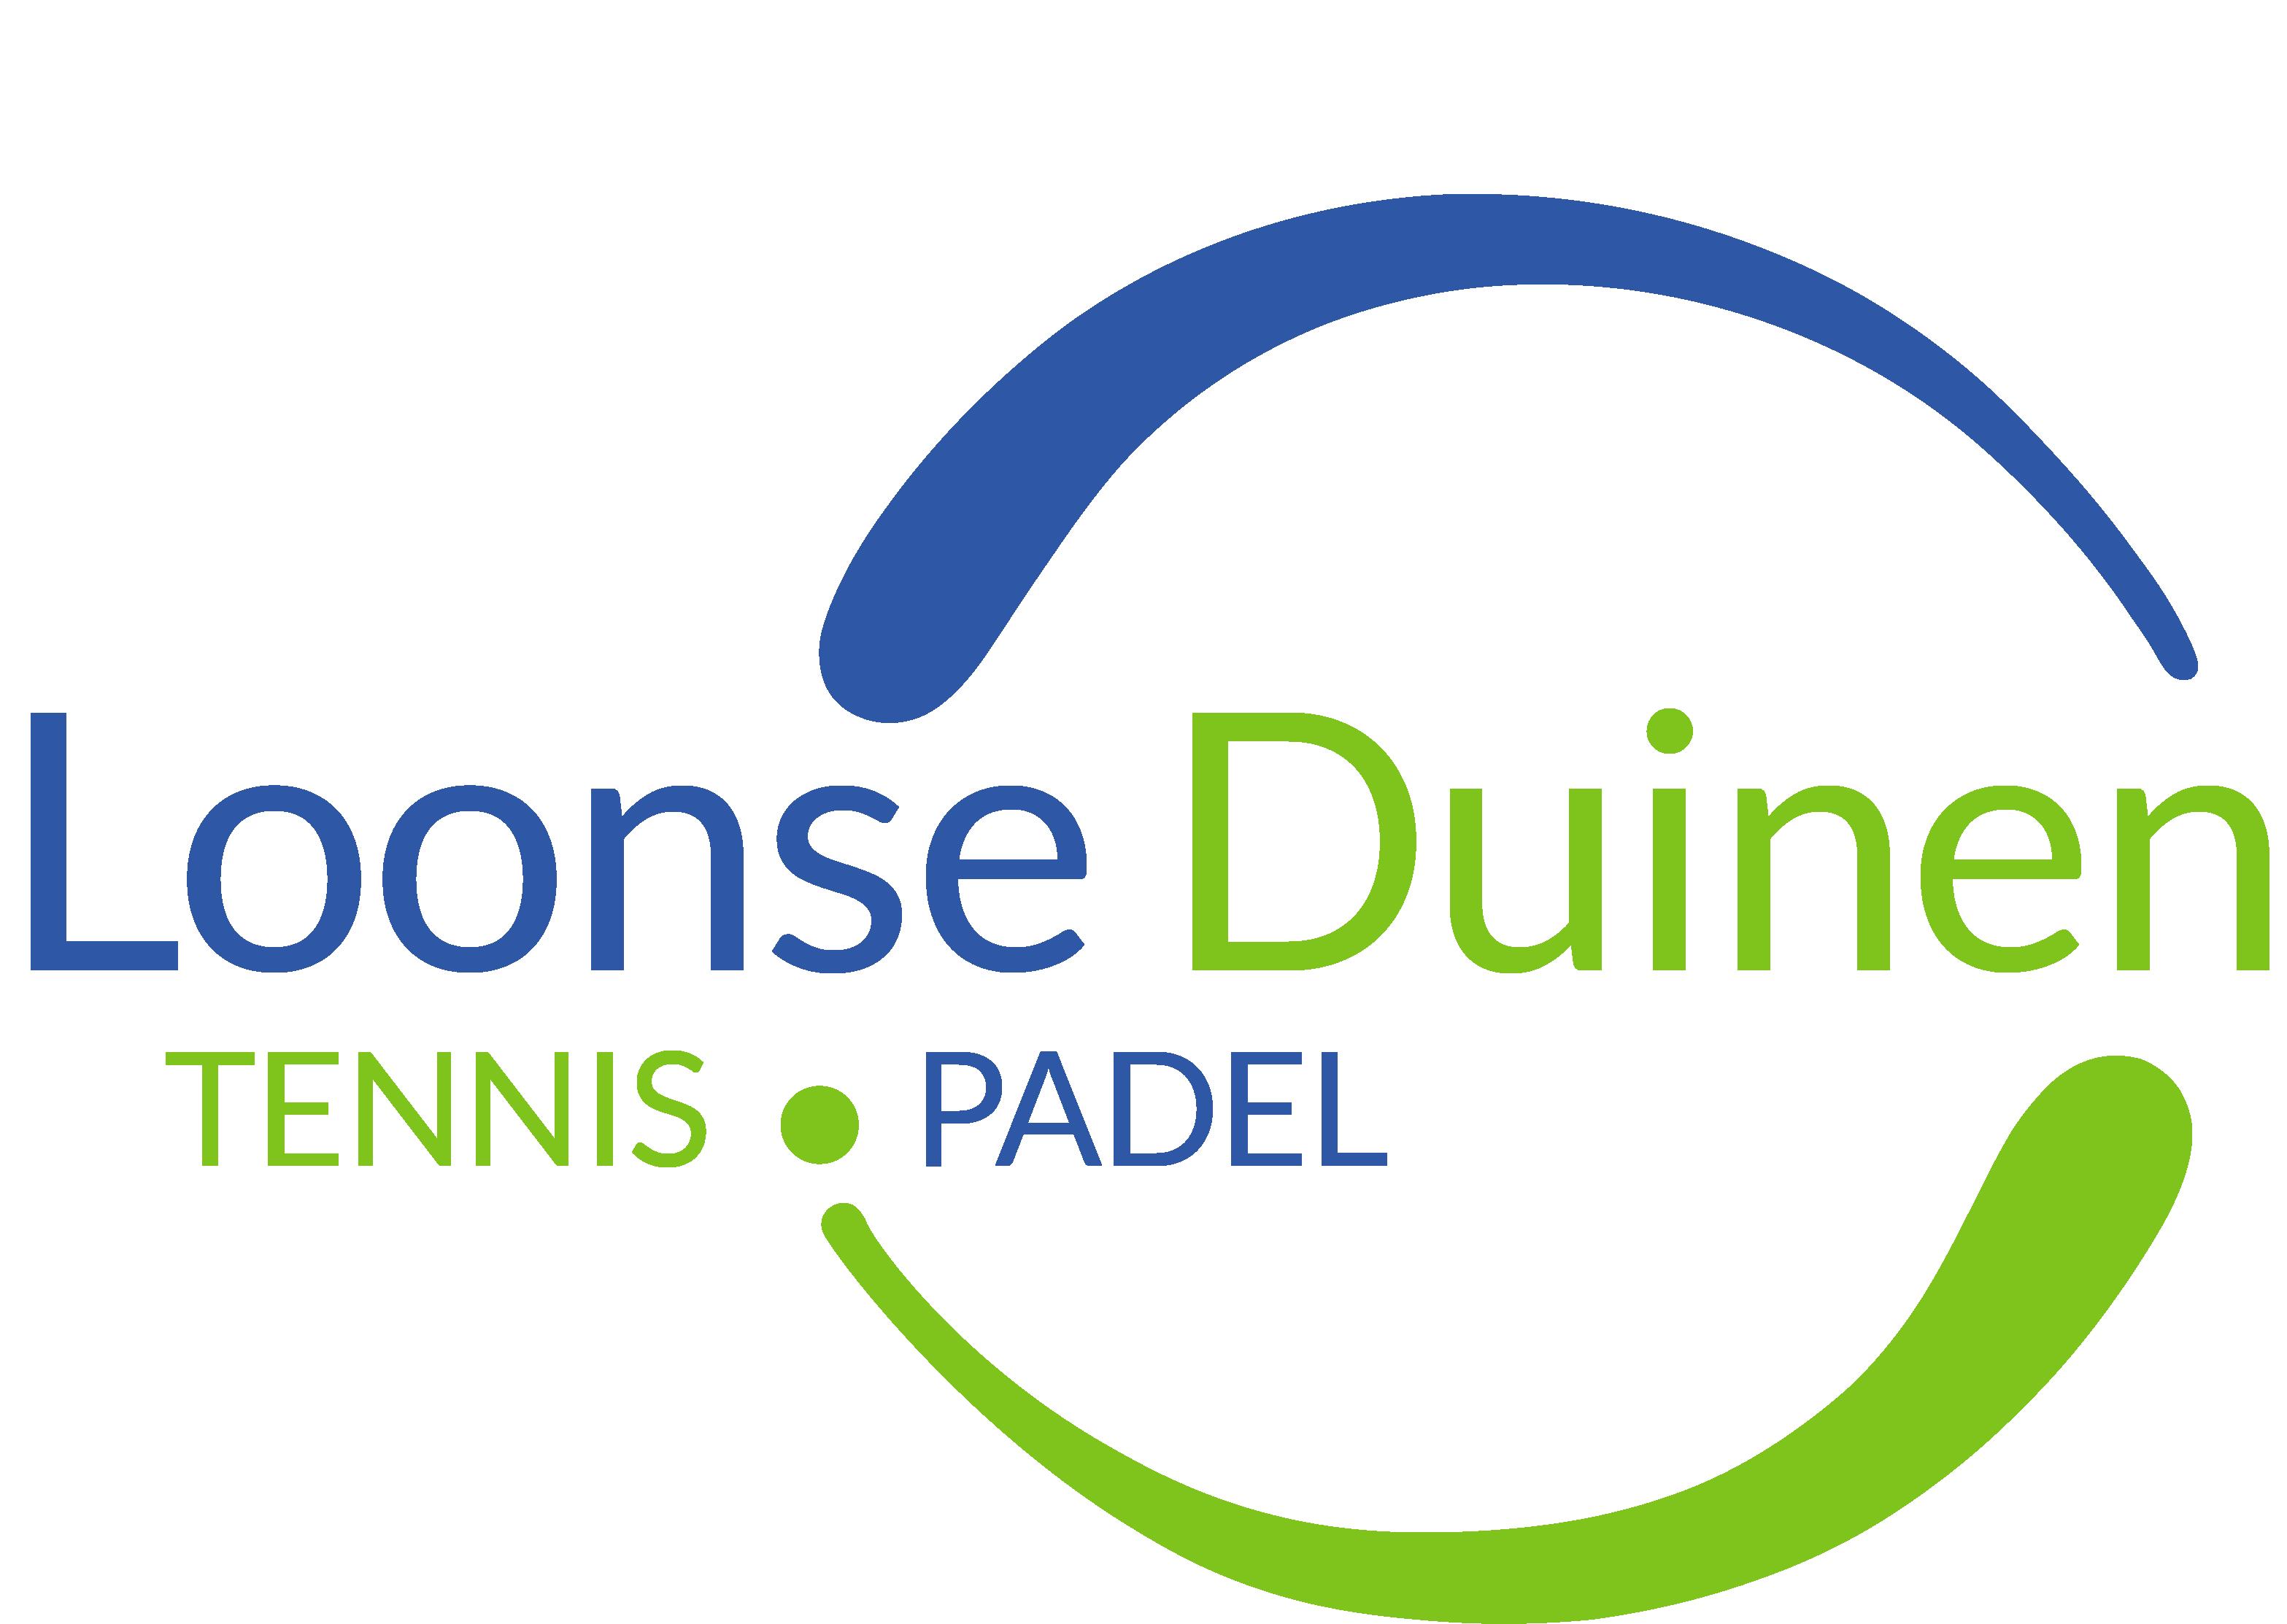 Tennis en Padel Loonse Duinen